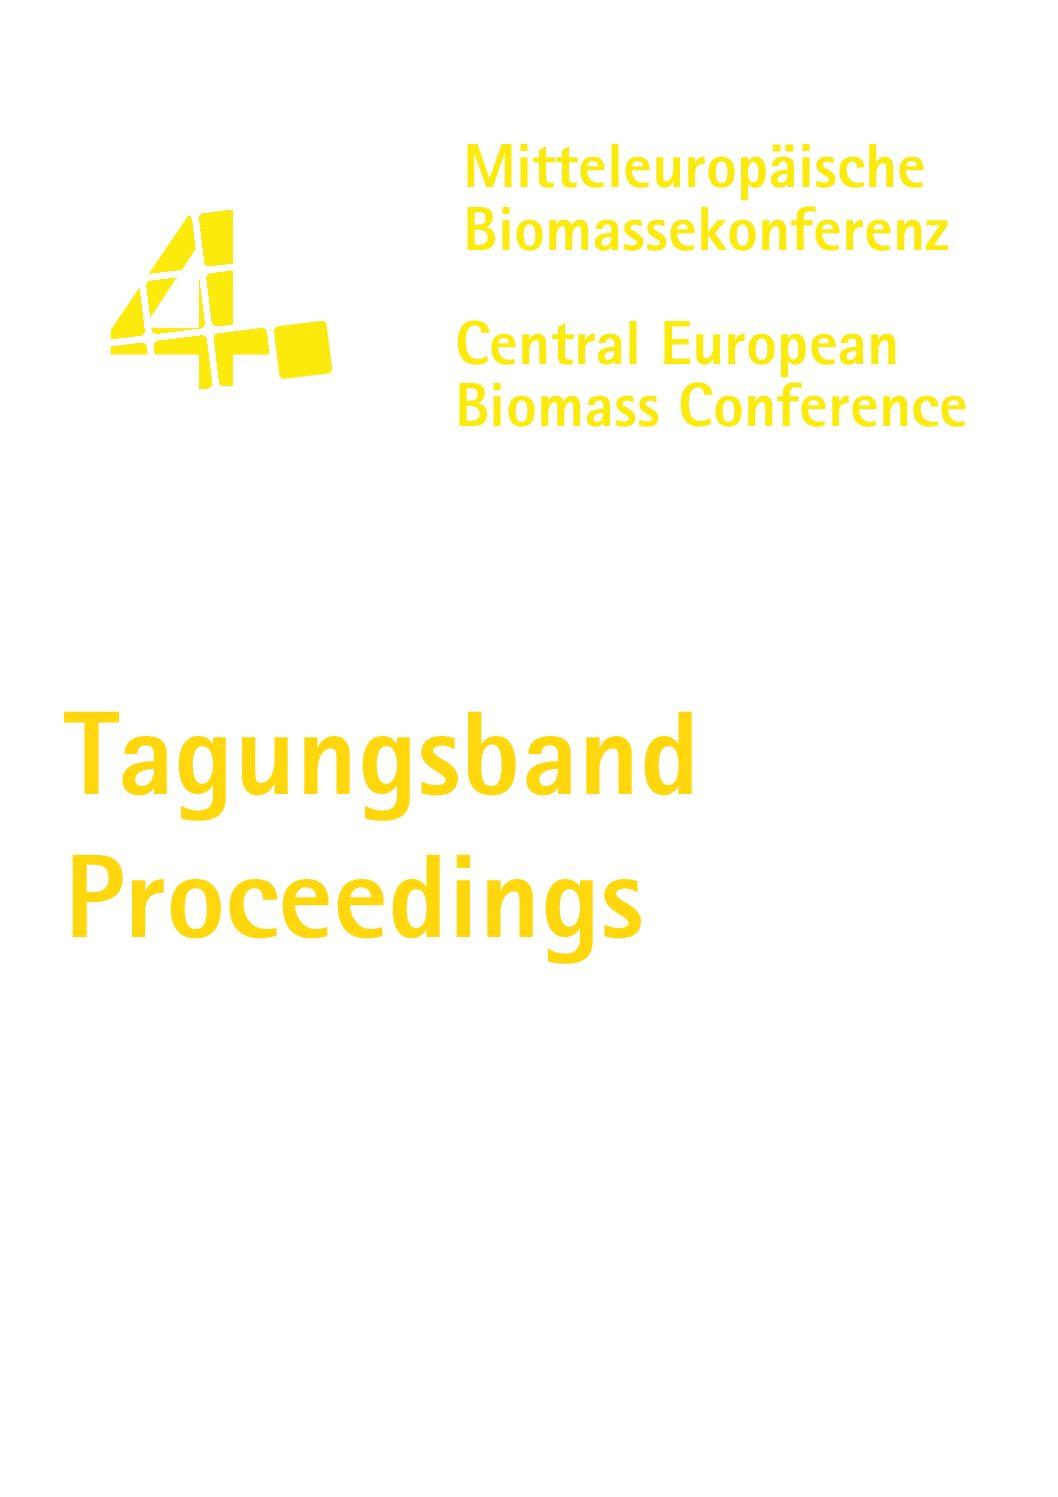 Tagungsband / Conference Proceedings CEBC 2014